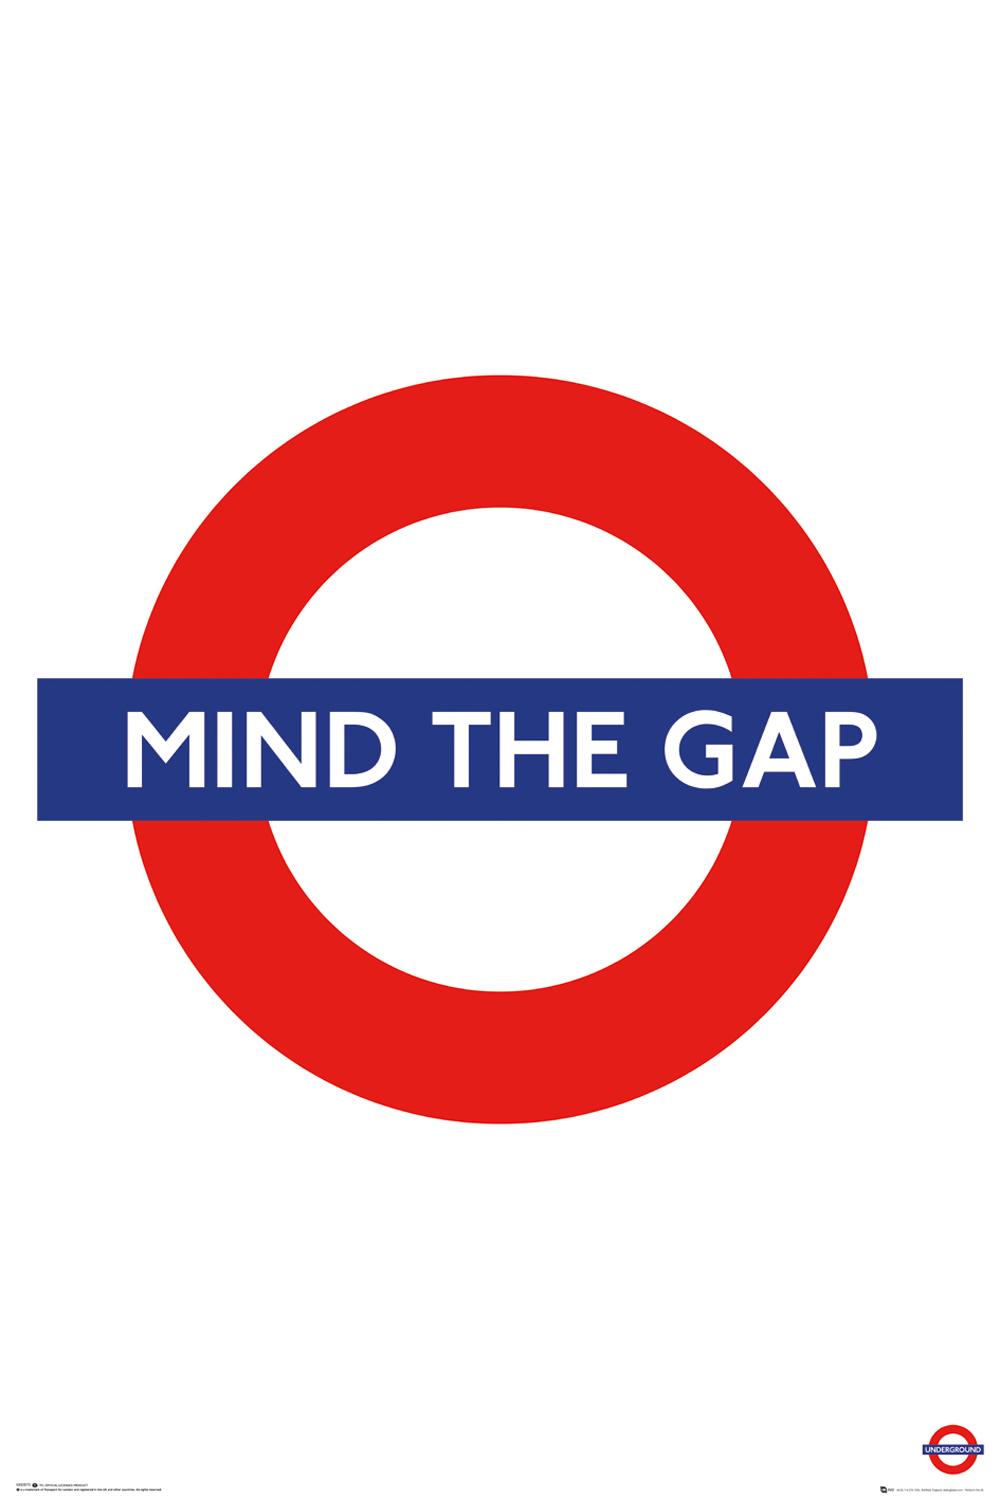 TFL mind the gap maxi poster